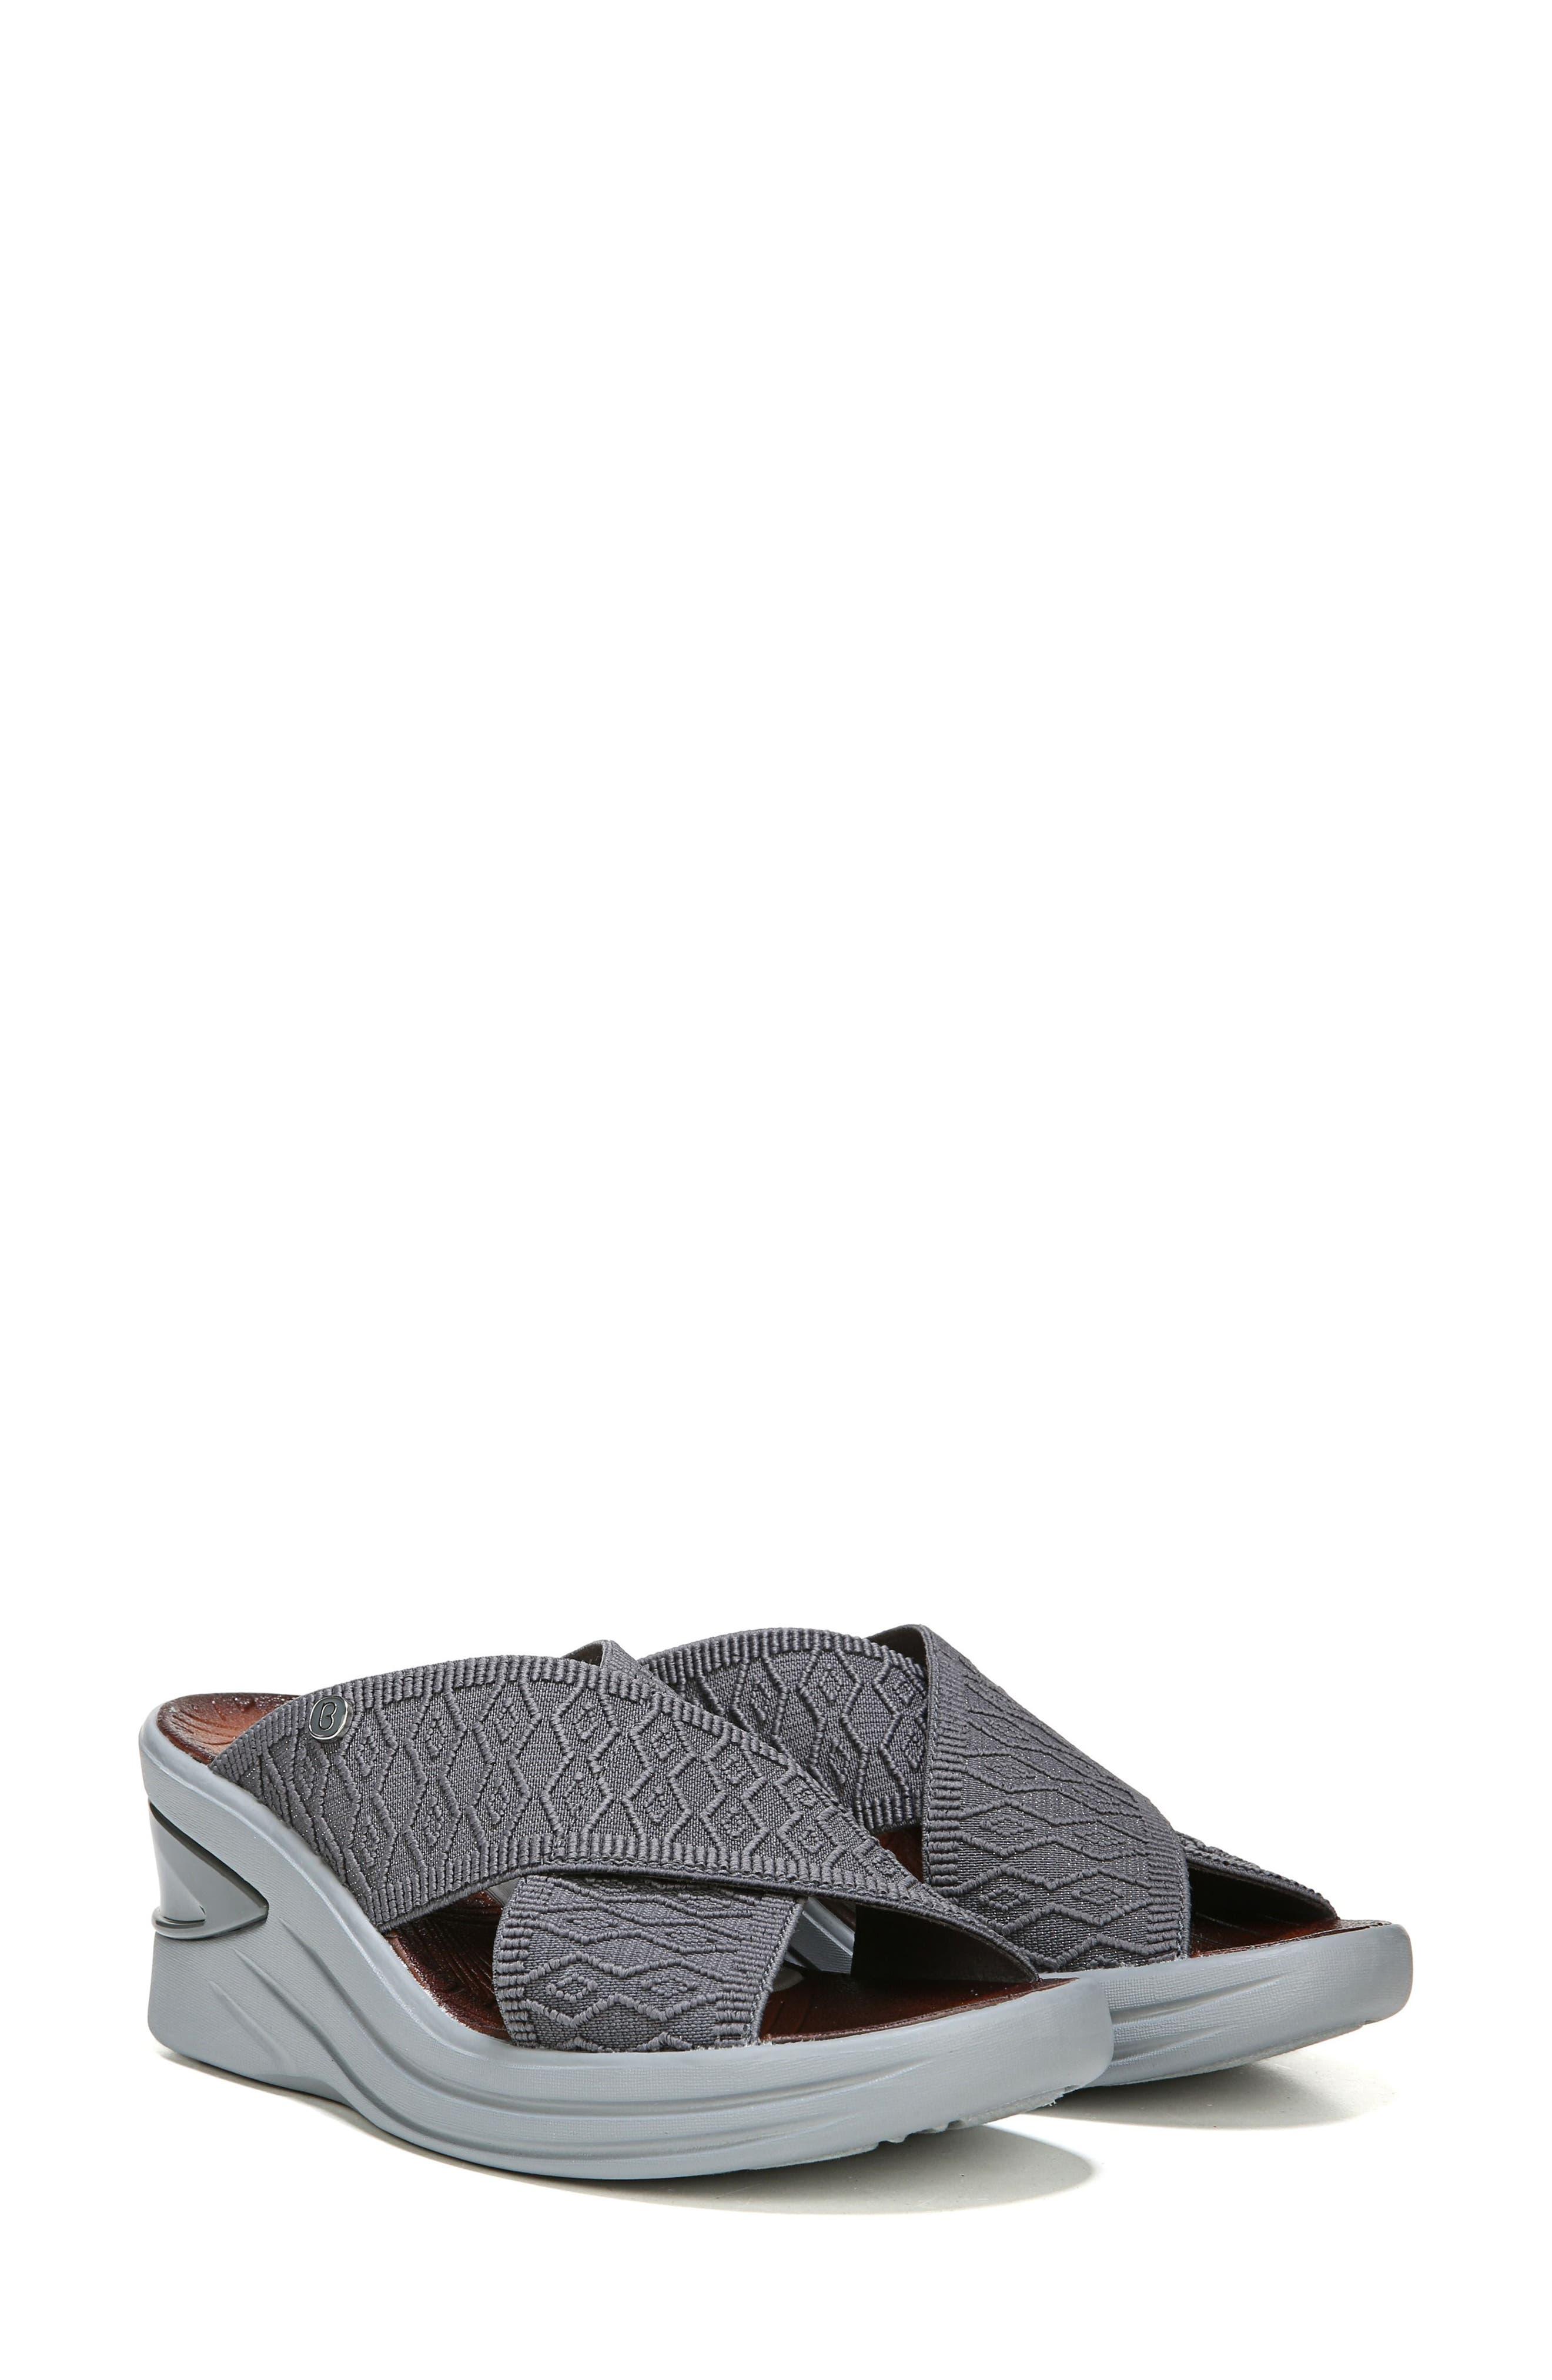 Vista Slide Sandal,                             Alternate thumbnail 8, color,                             PEWTER FABRIC